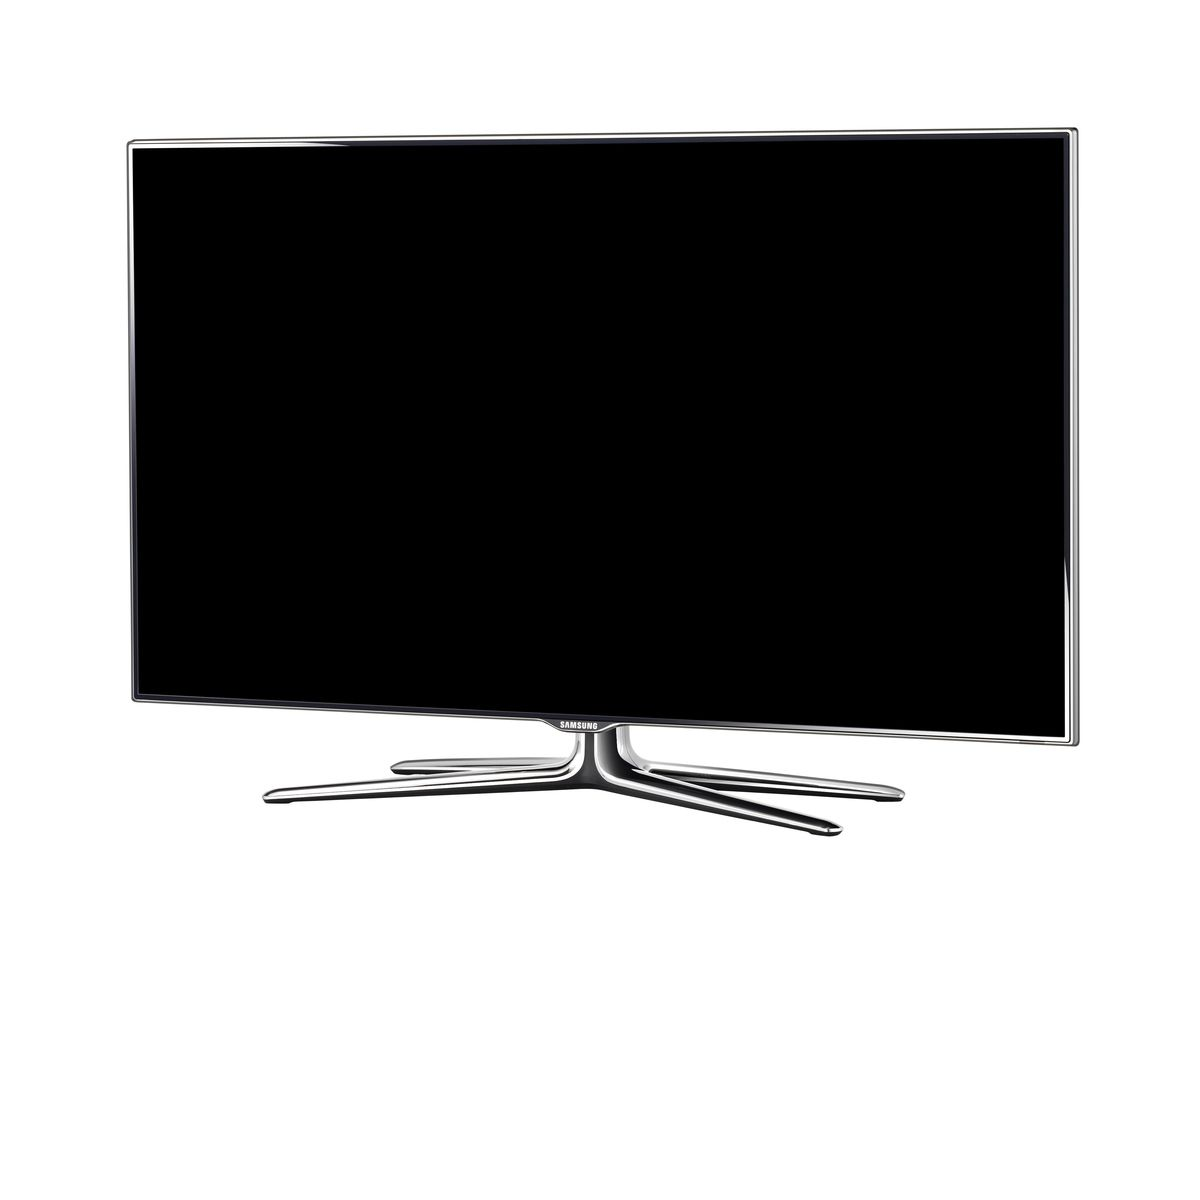 "Samsung Refurbished 60"" Class 1080p 240Hz 3D LED Ultra-Slim Smart HDTV-UN60ES7100"